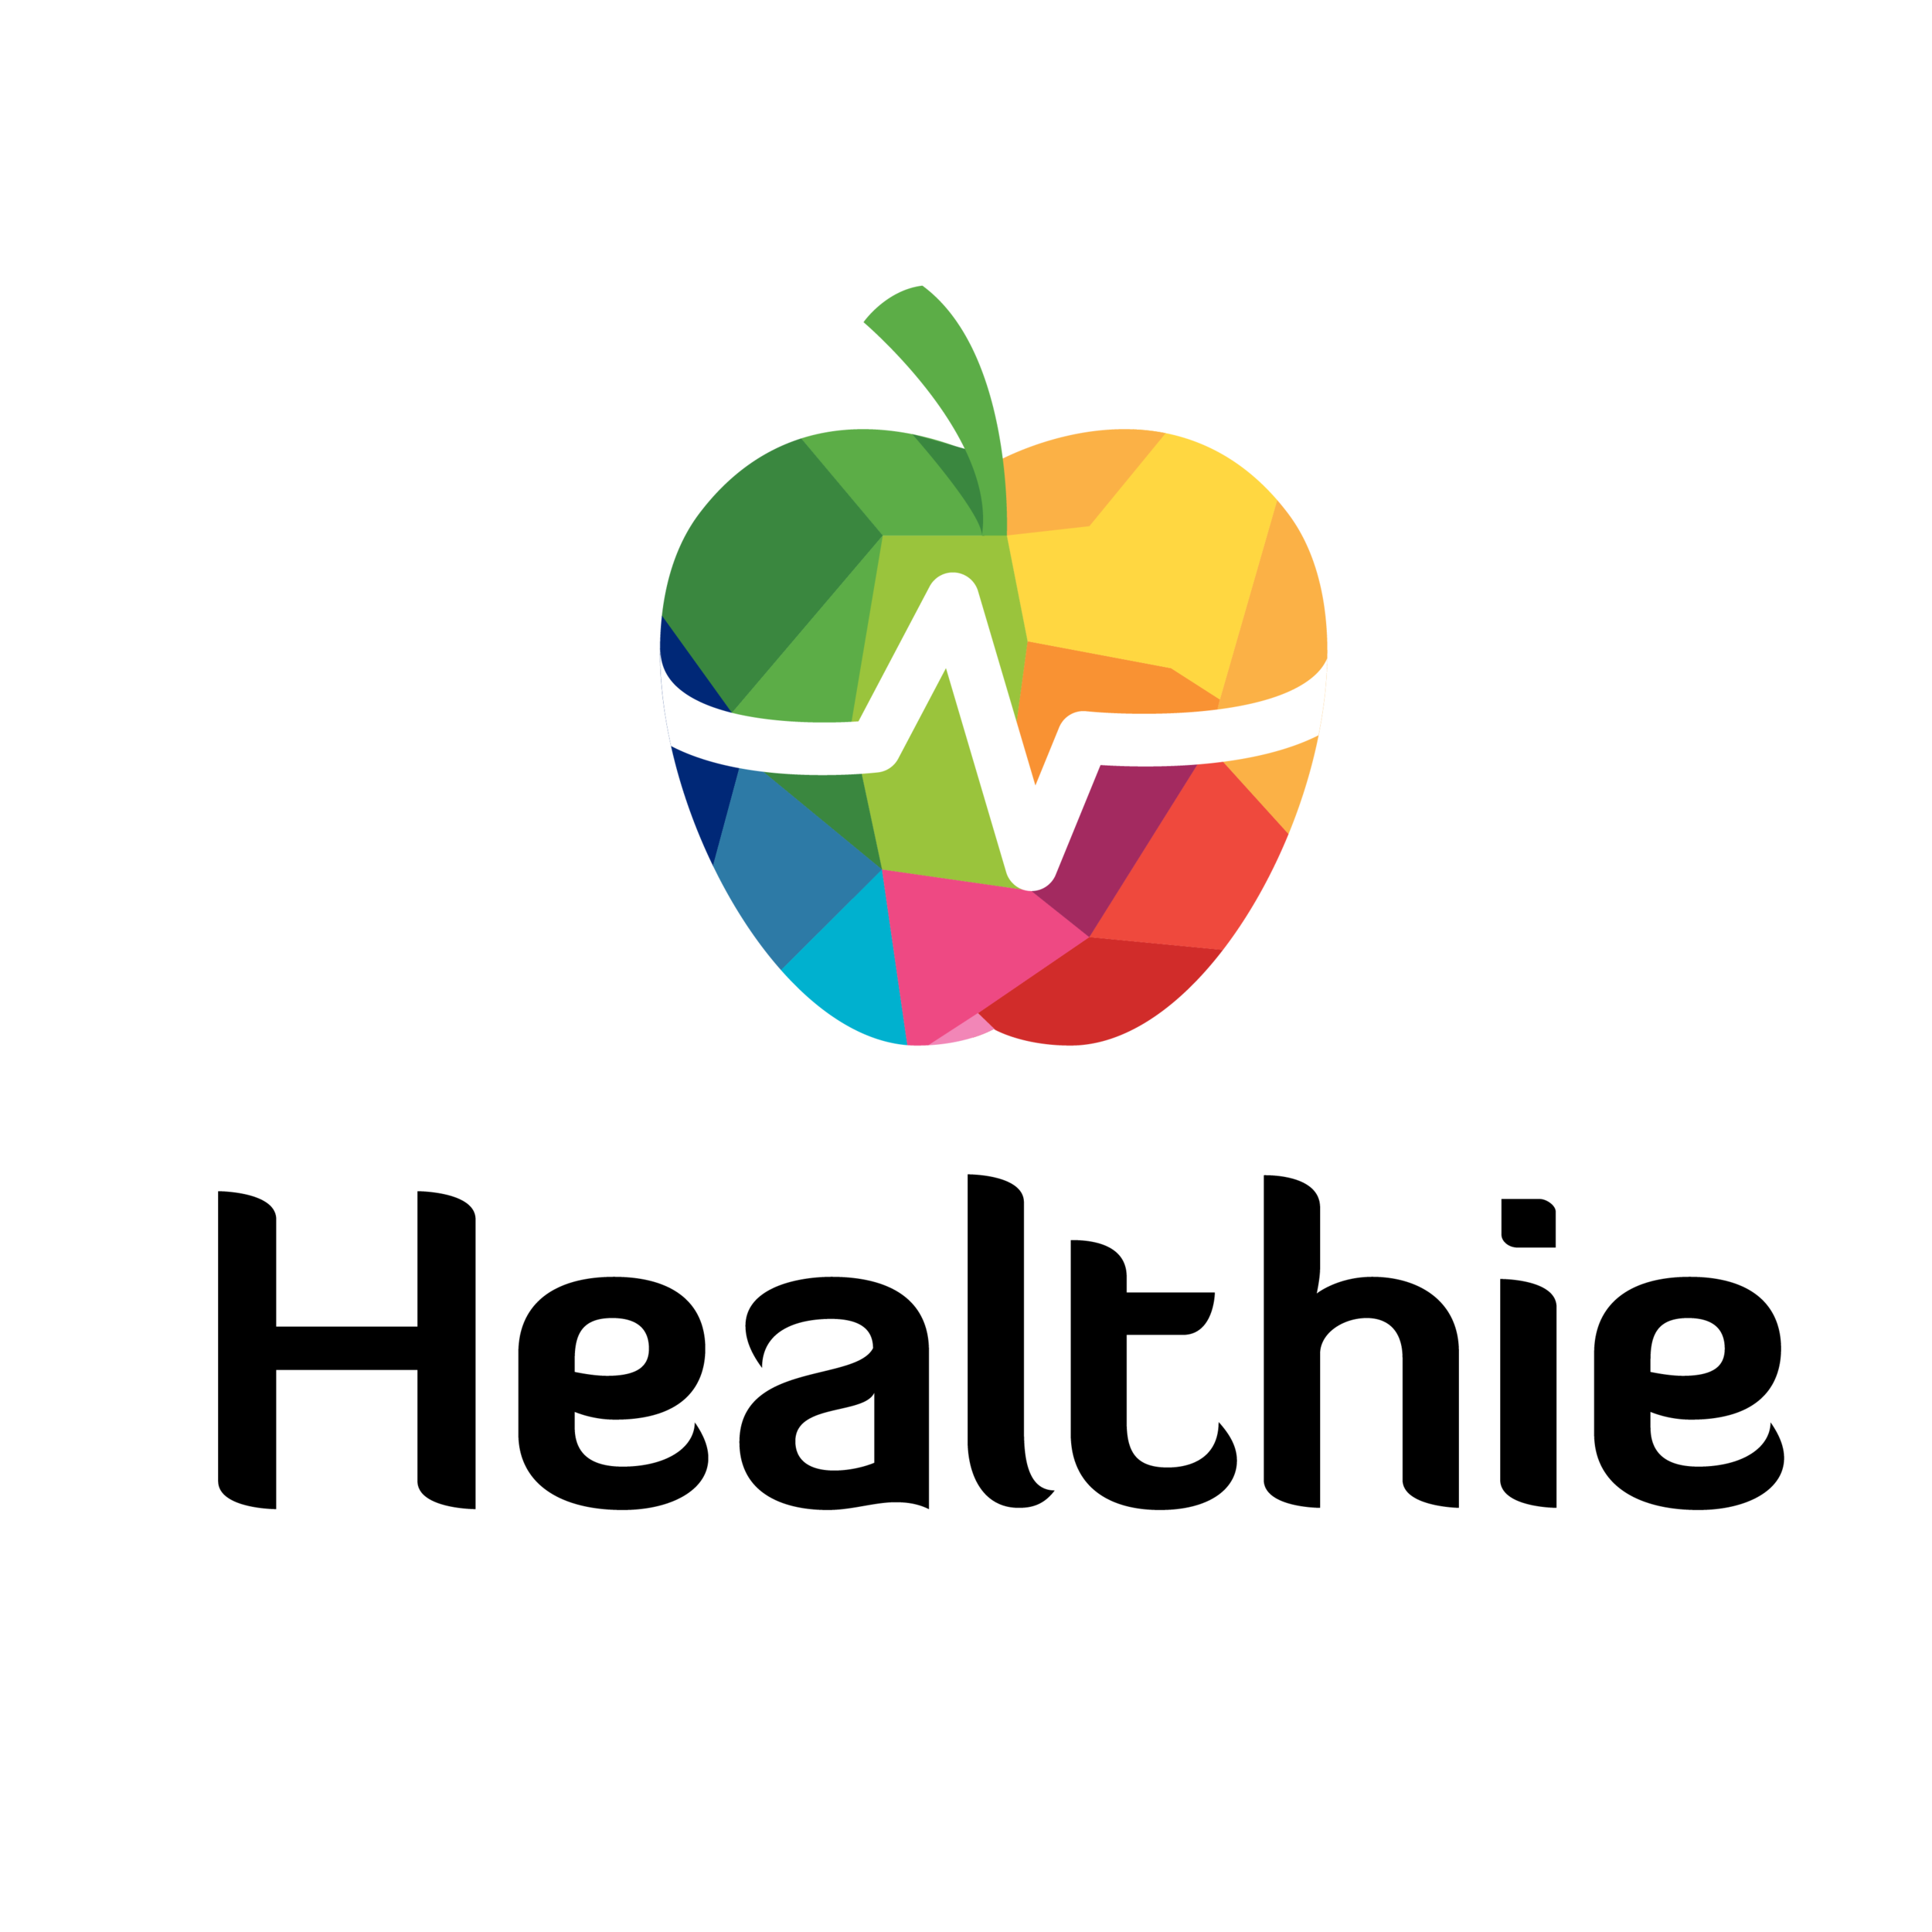 Healthie_Vertical_Logo-34be37603d59cfceb55b49f49b94df0cbcf2f6a725ab33d884506668377fd37c.png